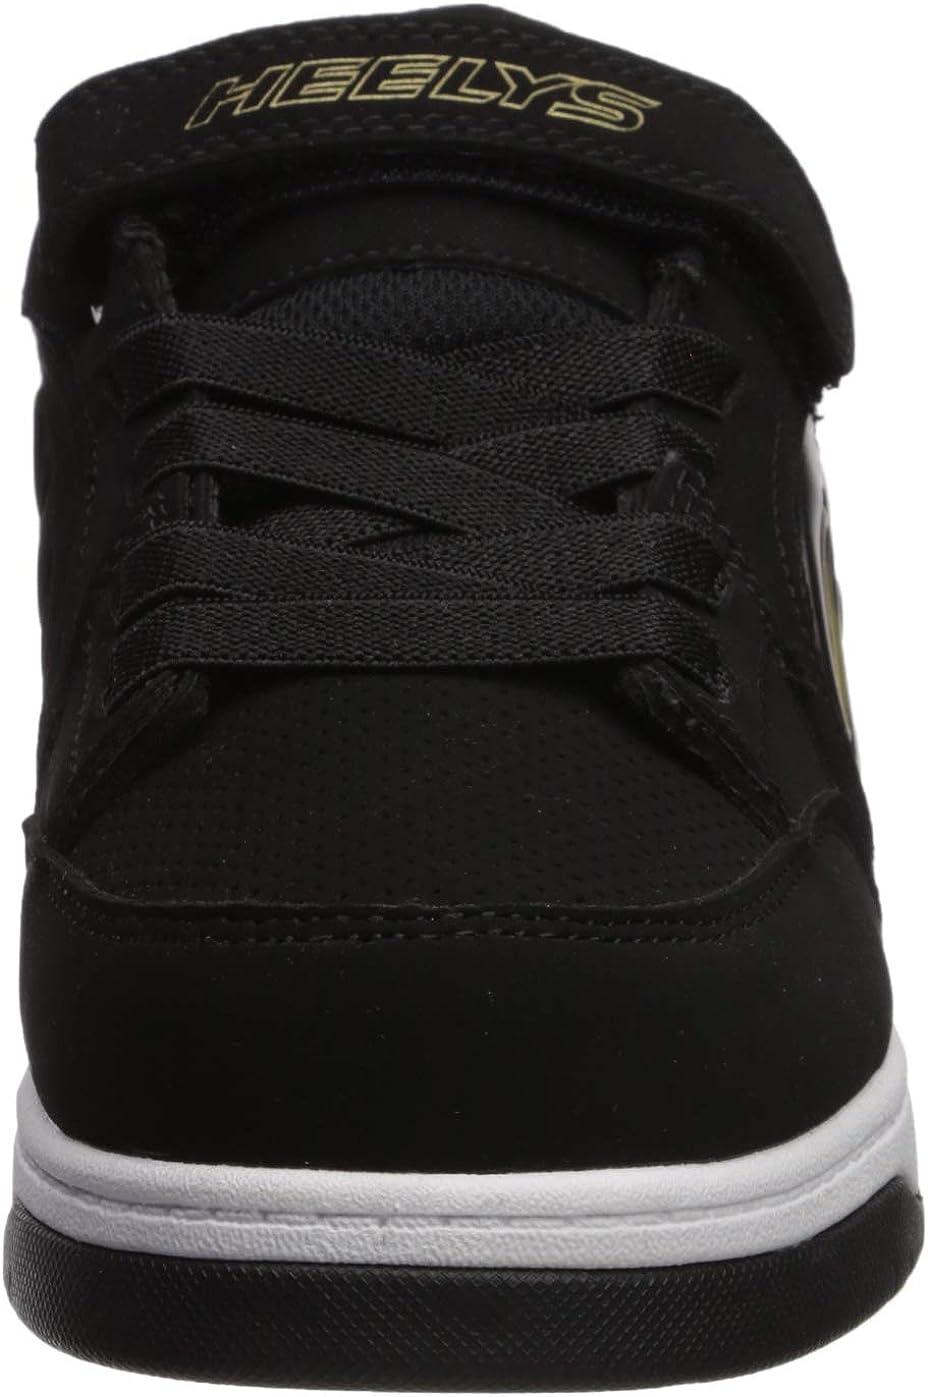 Heelys Kids Plus X2 Lights Tennis Shoe